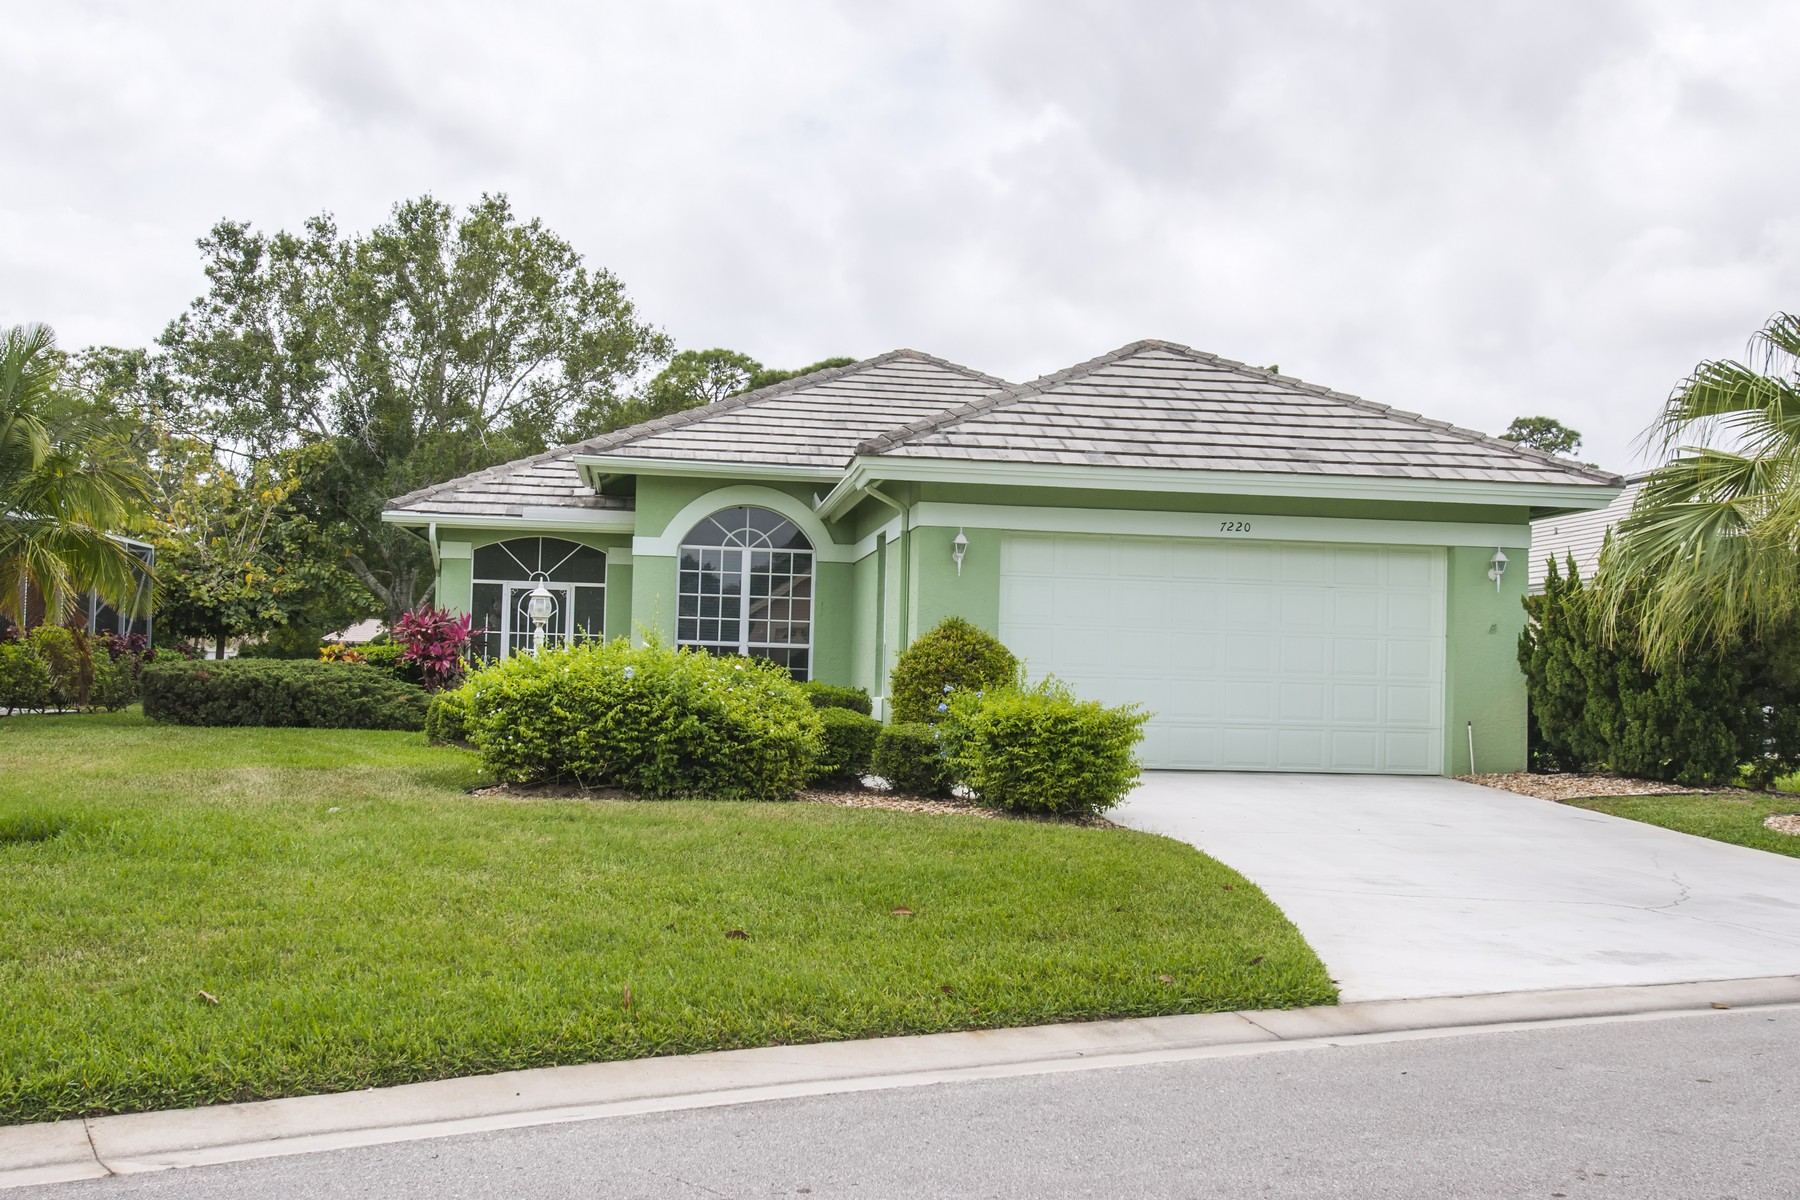 獨棟家庭住宅 為 出售 在 Private Setting with Lake and Preserve Views 7220 Marsh Terrace Port St. Lucie, 佛羅里達州, 34986 美國